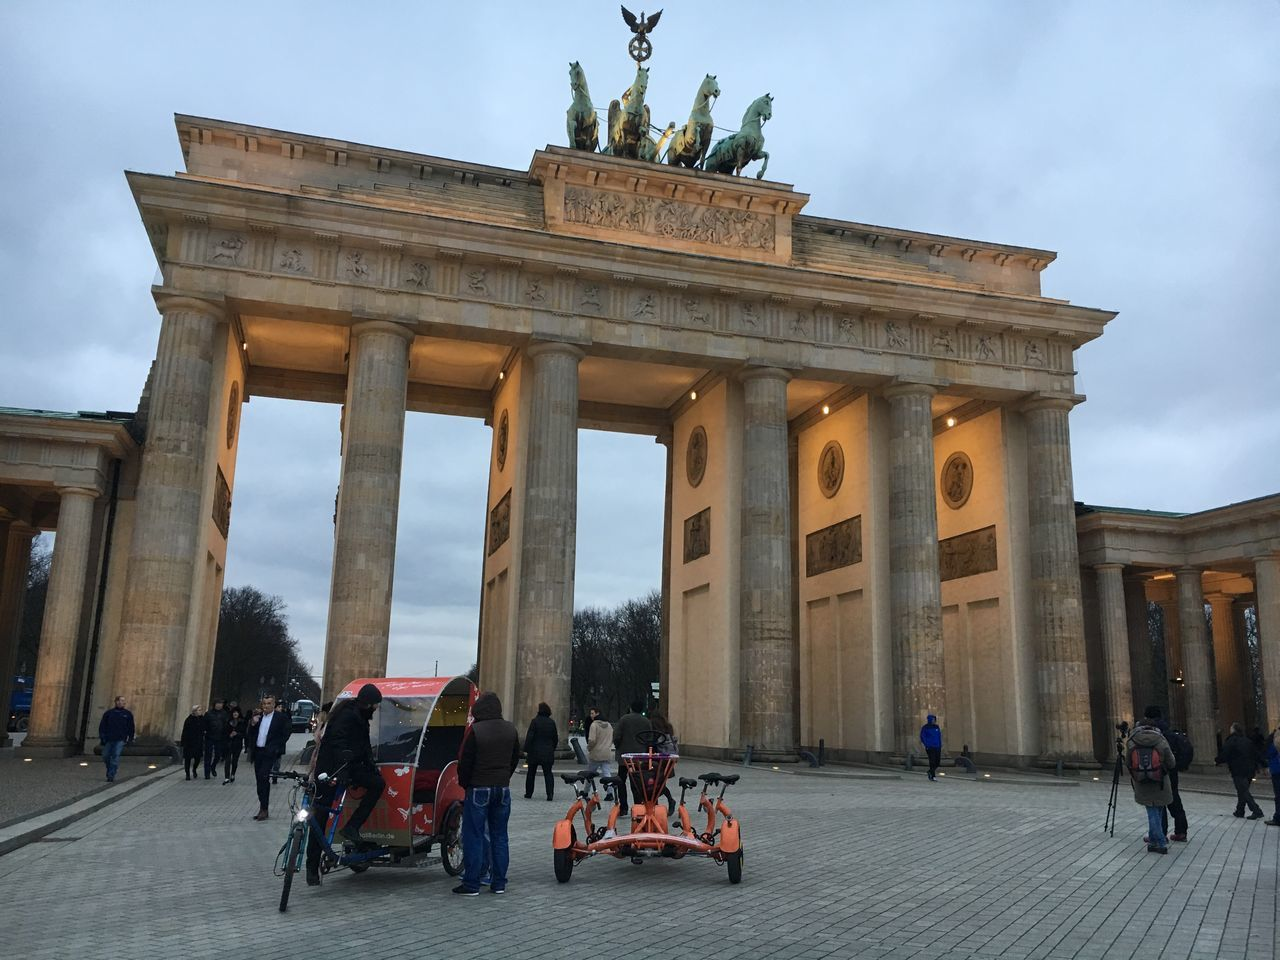 Berlin Berlin Brandenburgertor Berlinstyl Bikes Alone In The City  Alone Germany ITB Architecture Historical Building Navamaagal